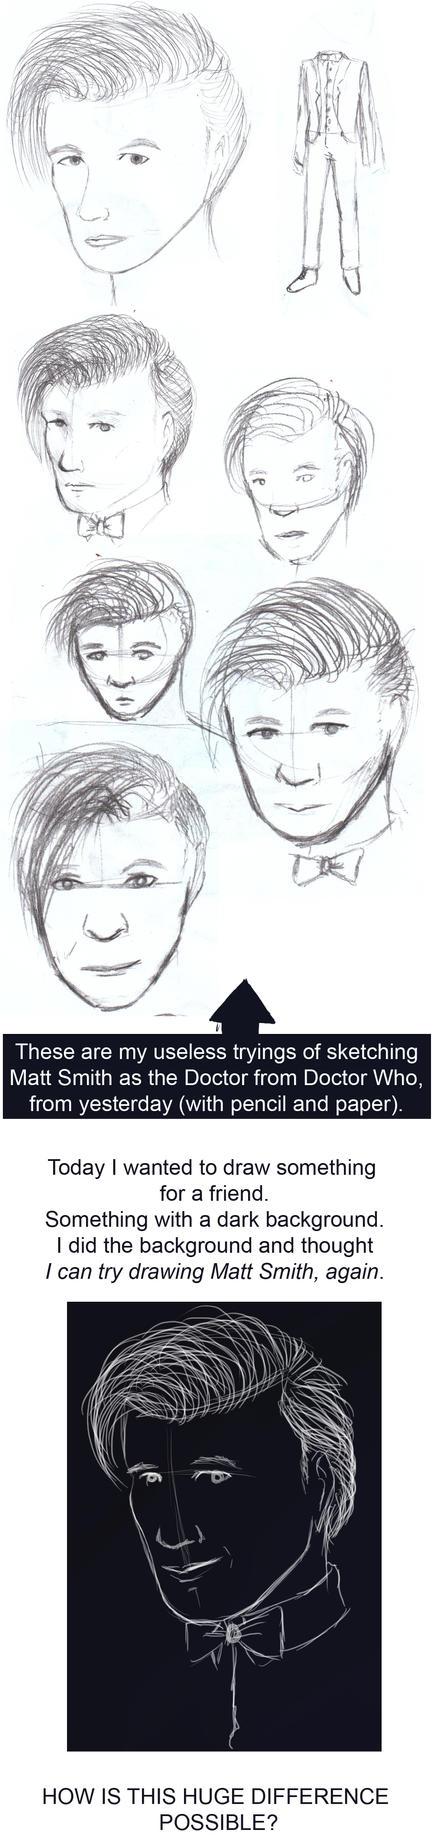 sketchdump - Matt Smith by JulLoy